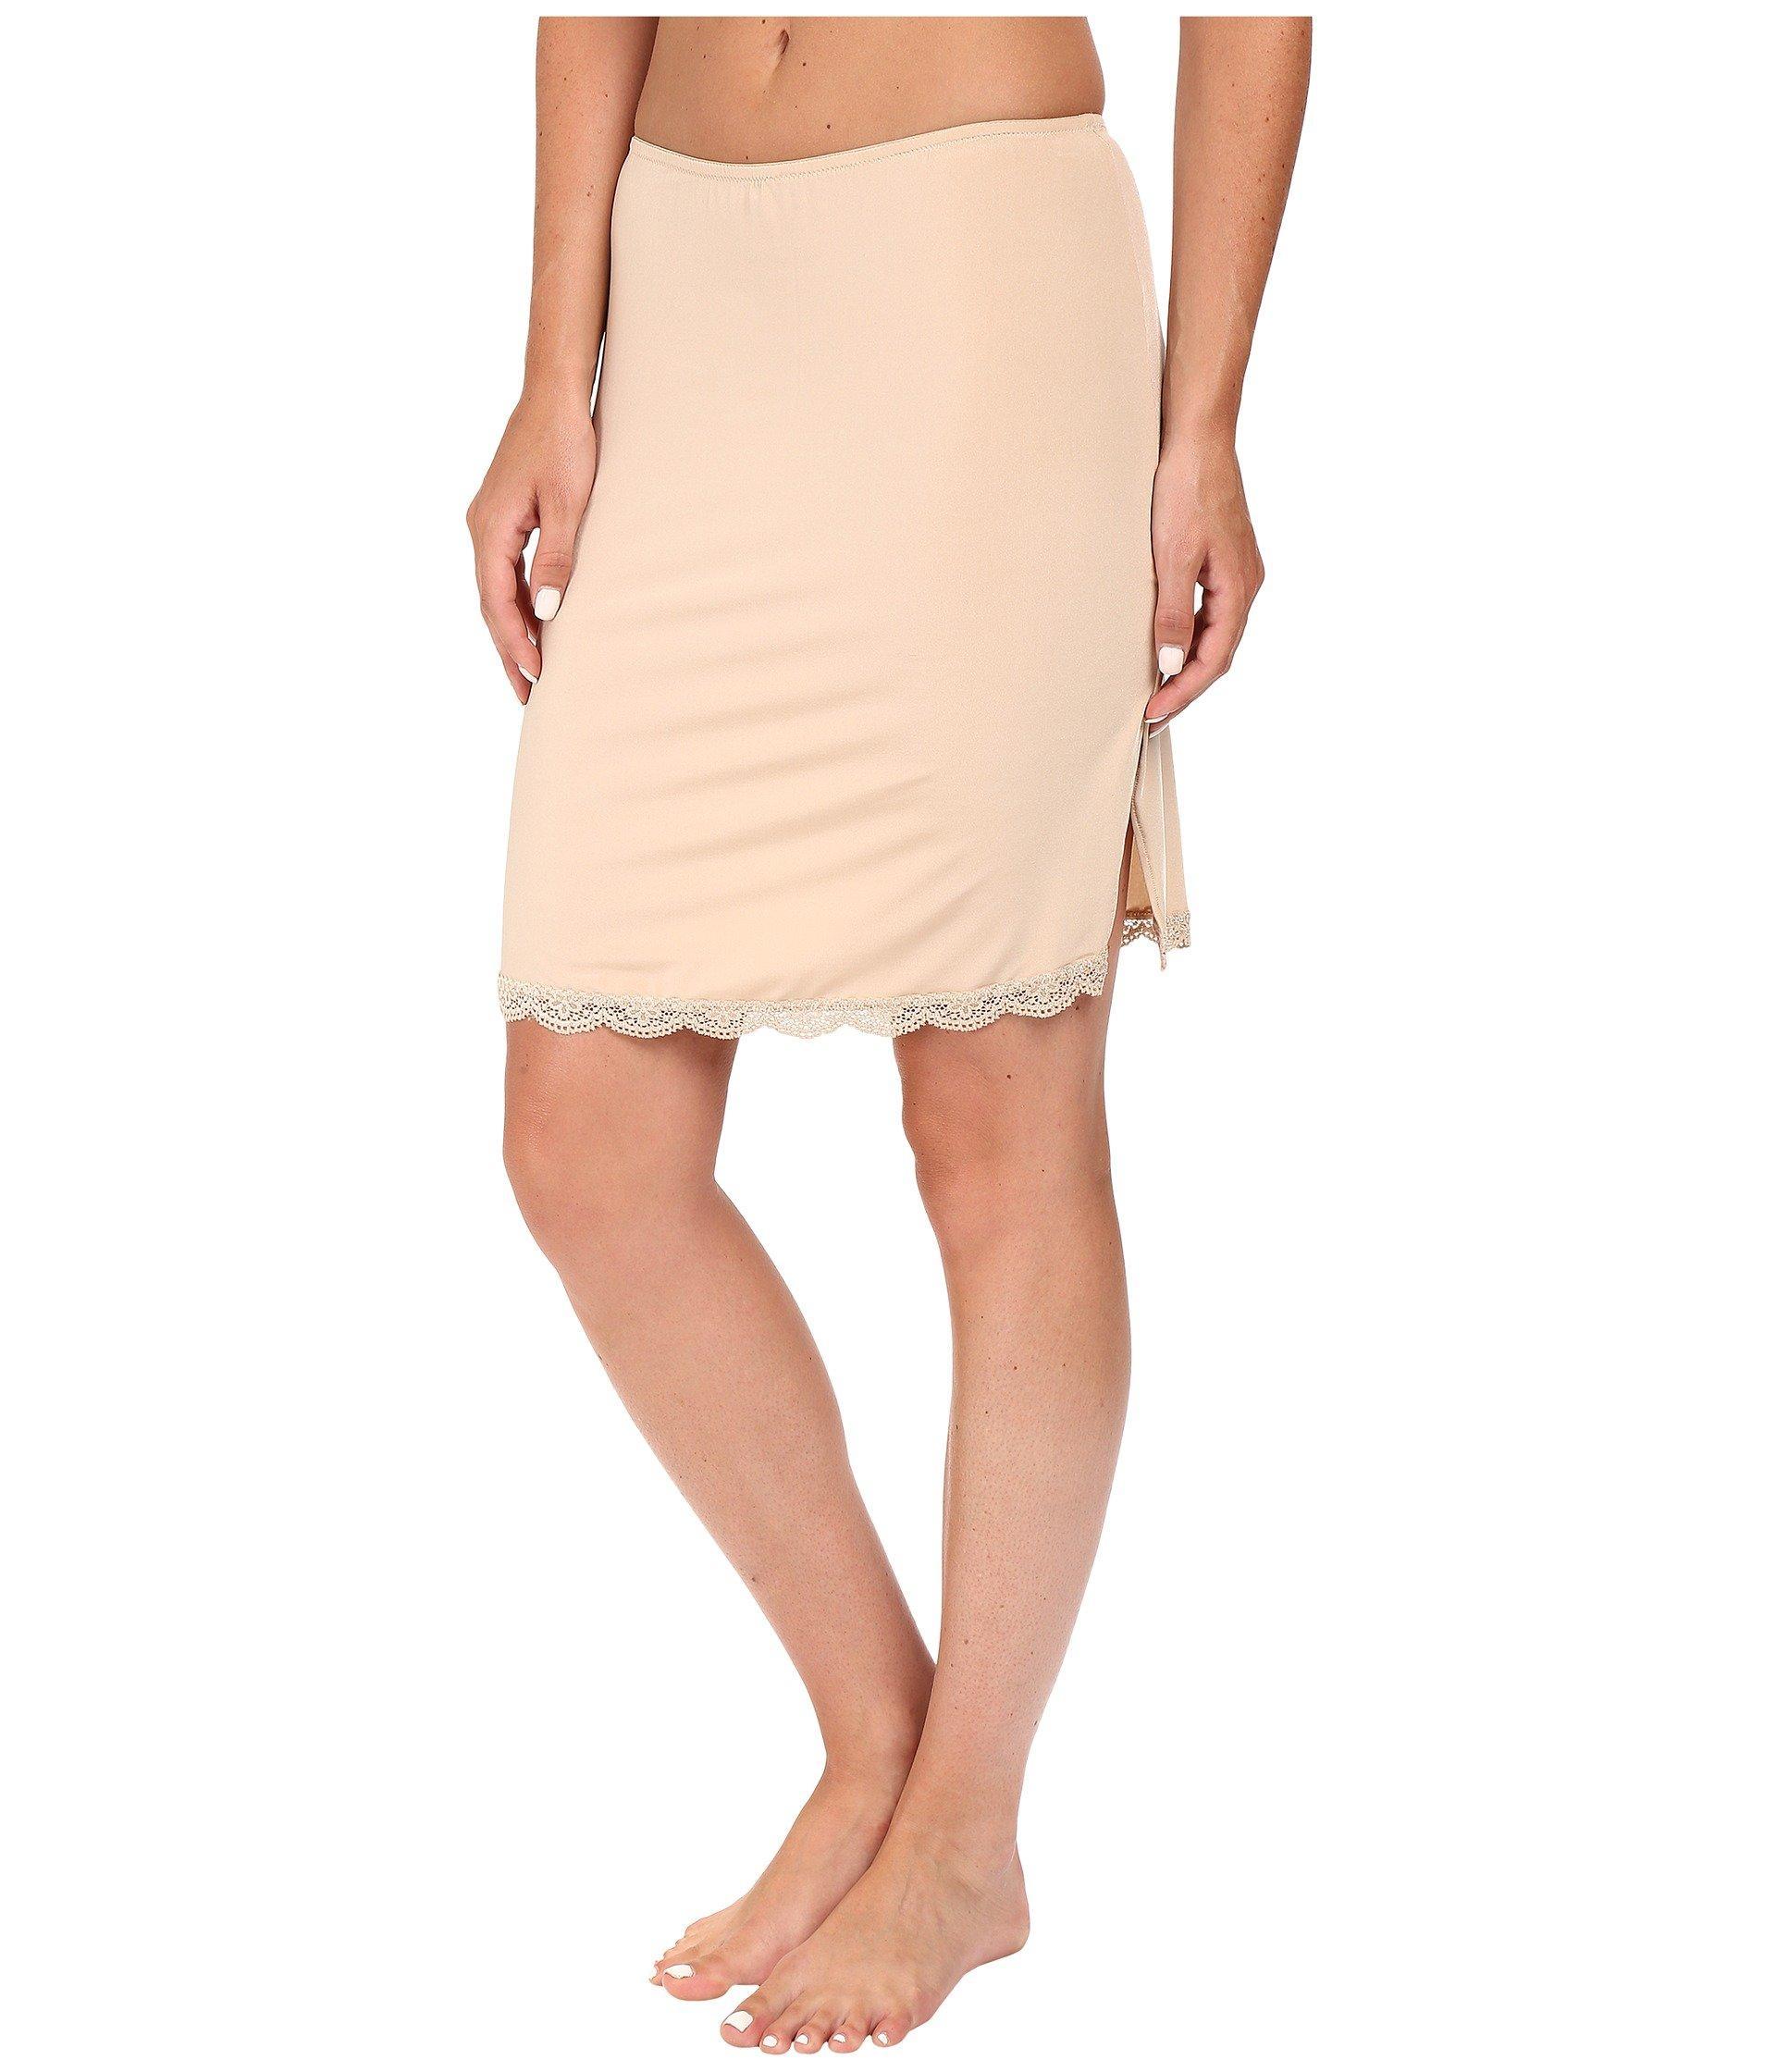 1c831ee443c3 Jockey No Panty Line Promise Tactel Lace Half Slip (sheer Nude) Women's  Underwear - Lyst